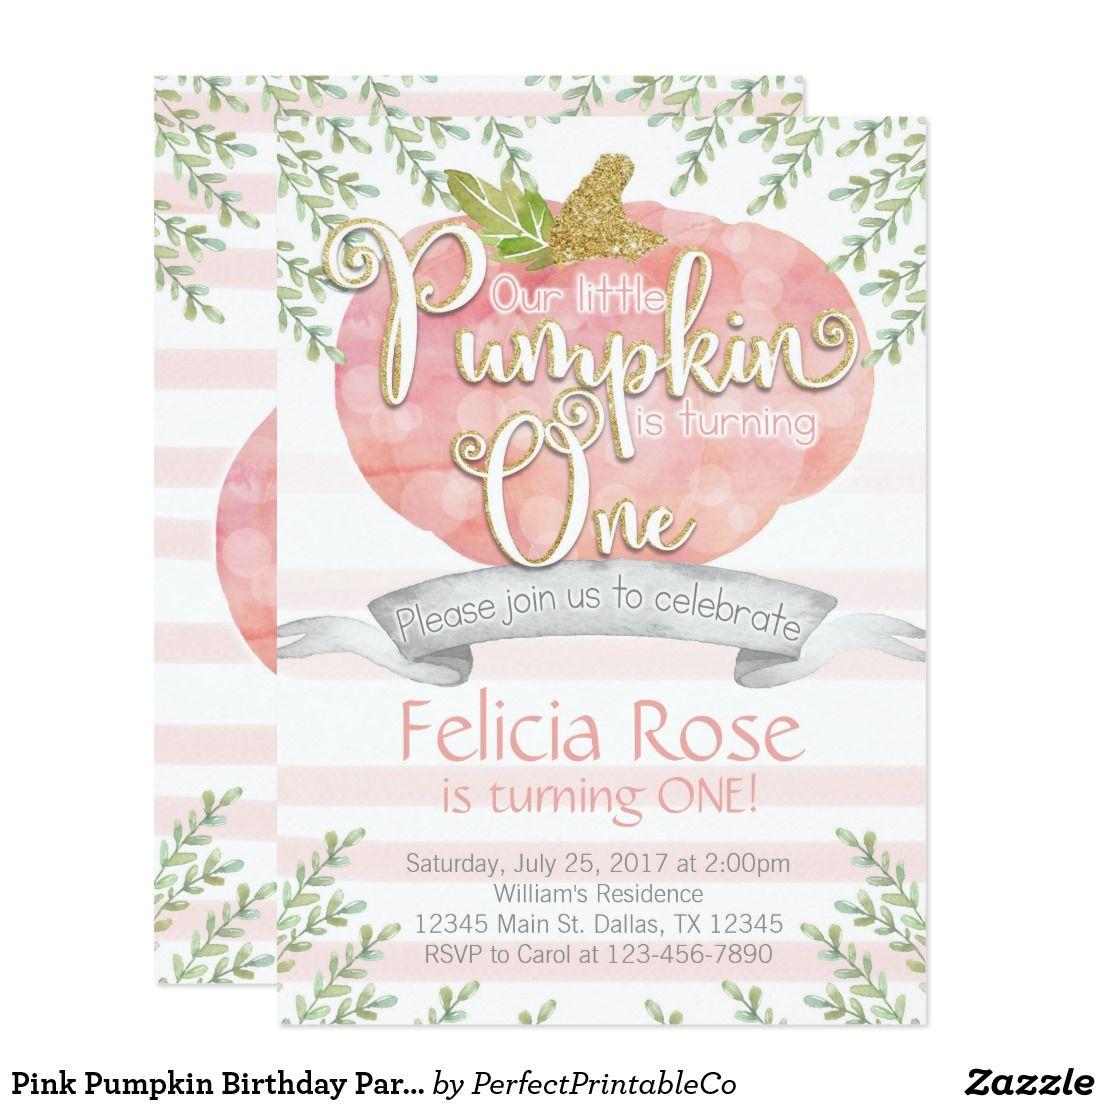 Pink Pumpkin Birthday Party Invitation Invite   Pumpkin birthday ...